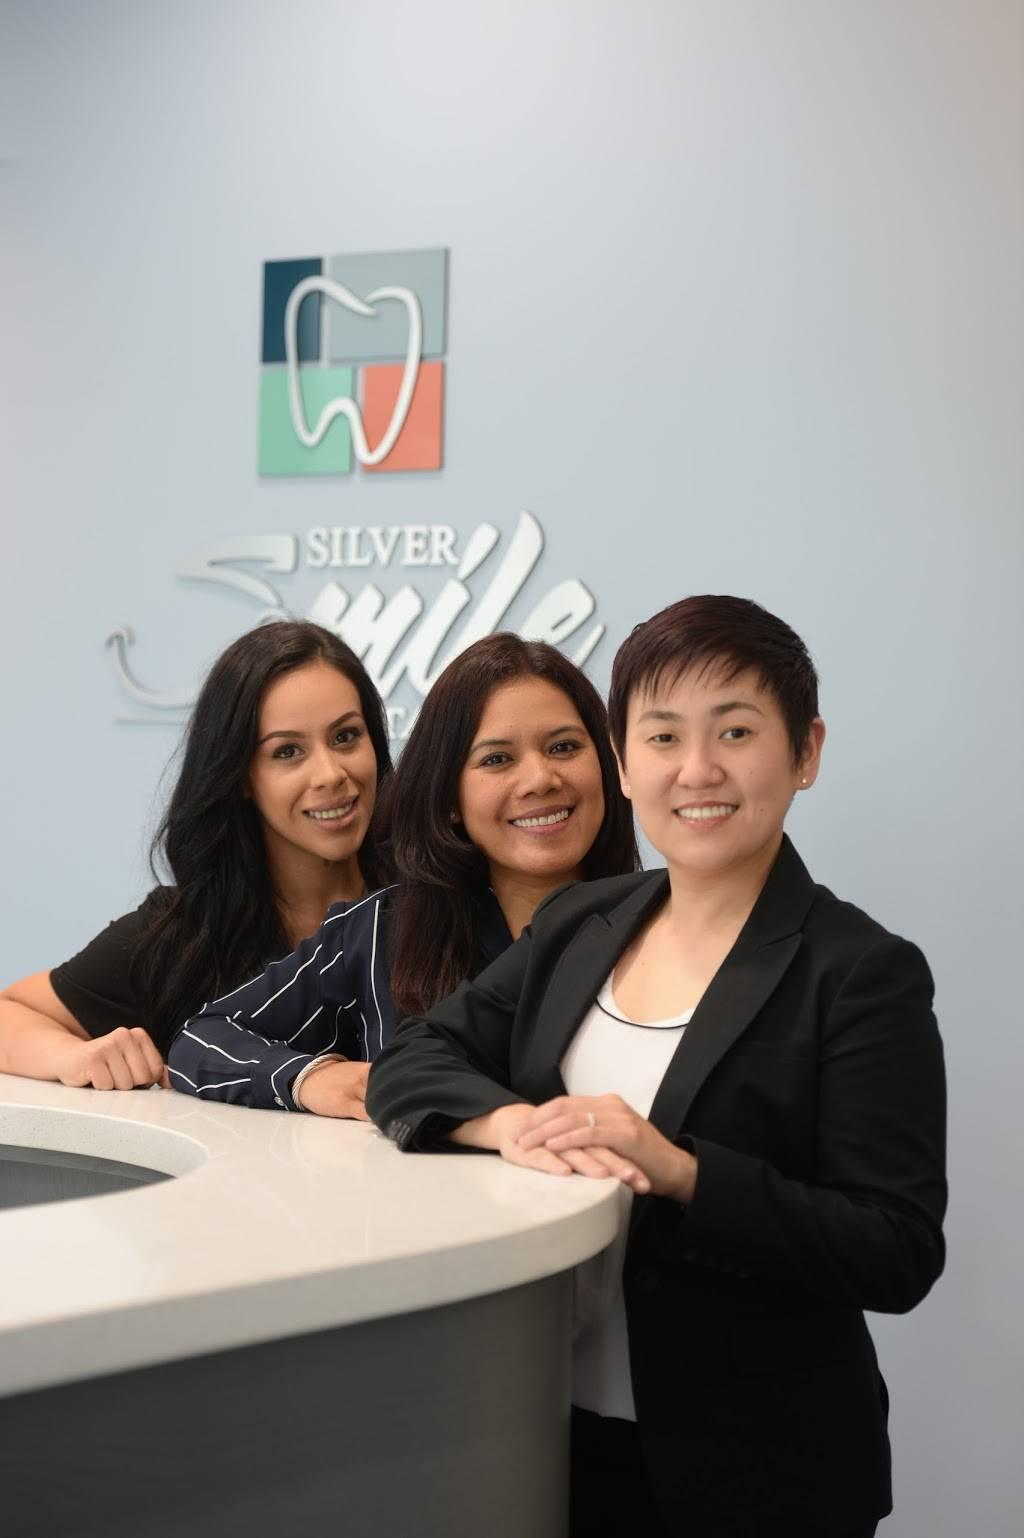 Silver Smile Dental - dentist  | Photo 6 of 7 | Address: 14683 Ramona Ave, Chino, CA 91710, USA | Phone: (909) 393-1600